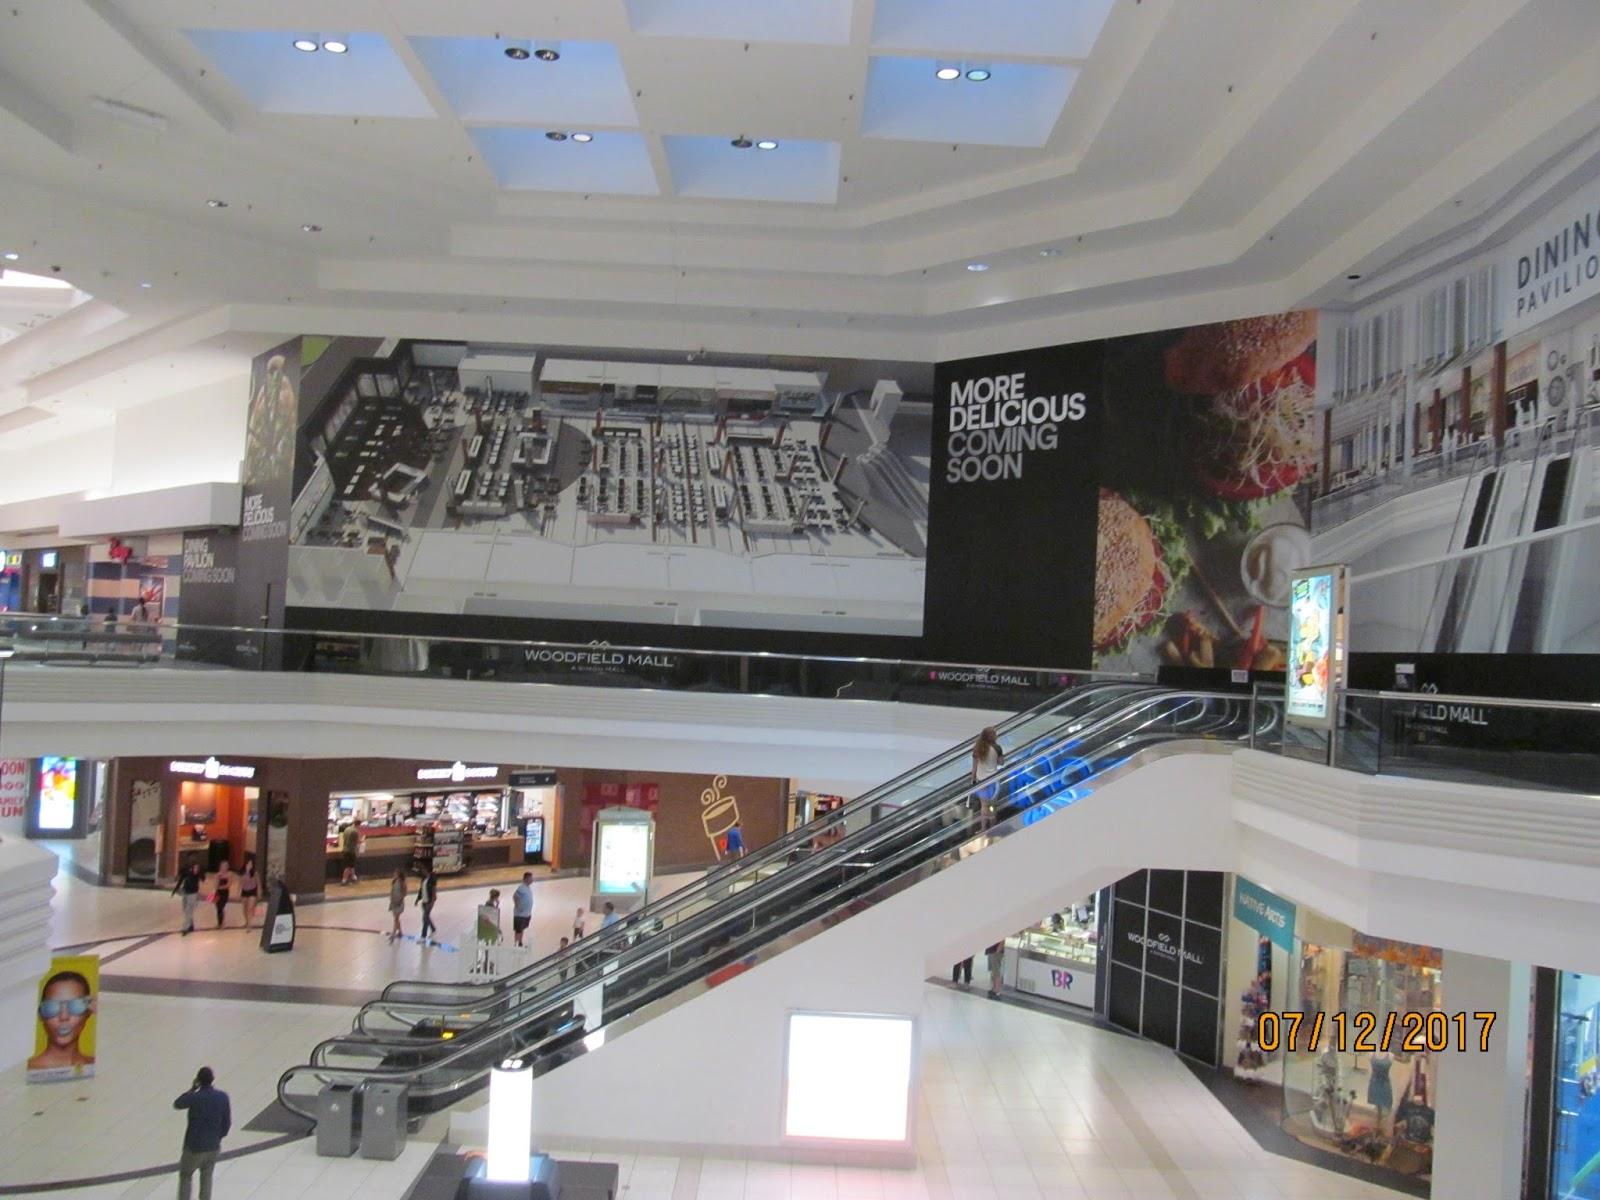 Aldo woodfield mall / Woodbury travel